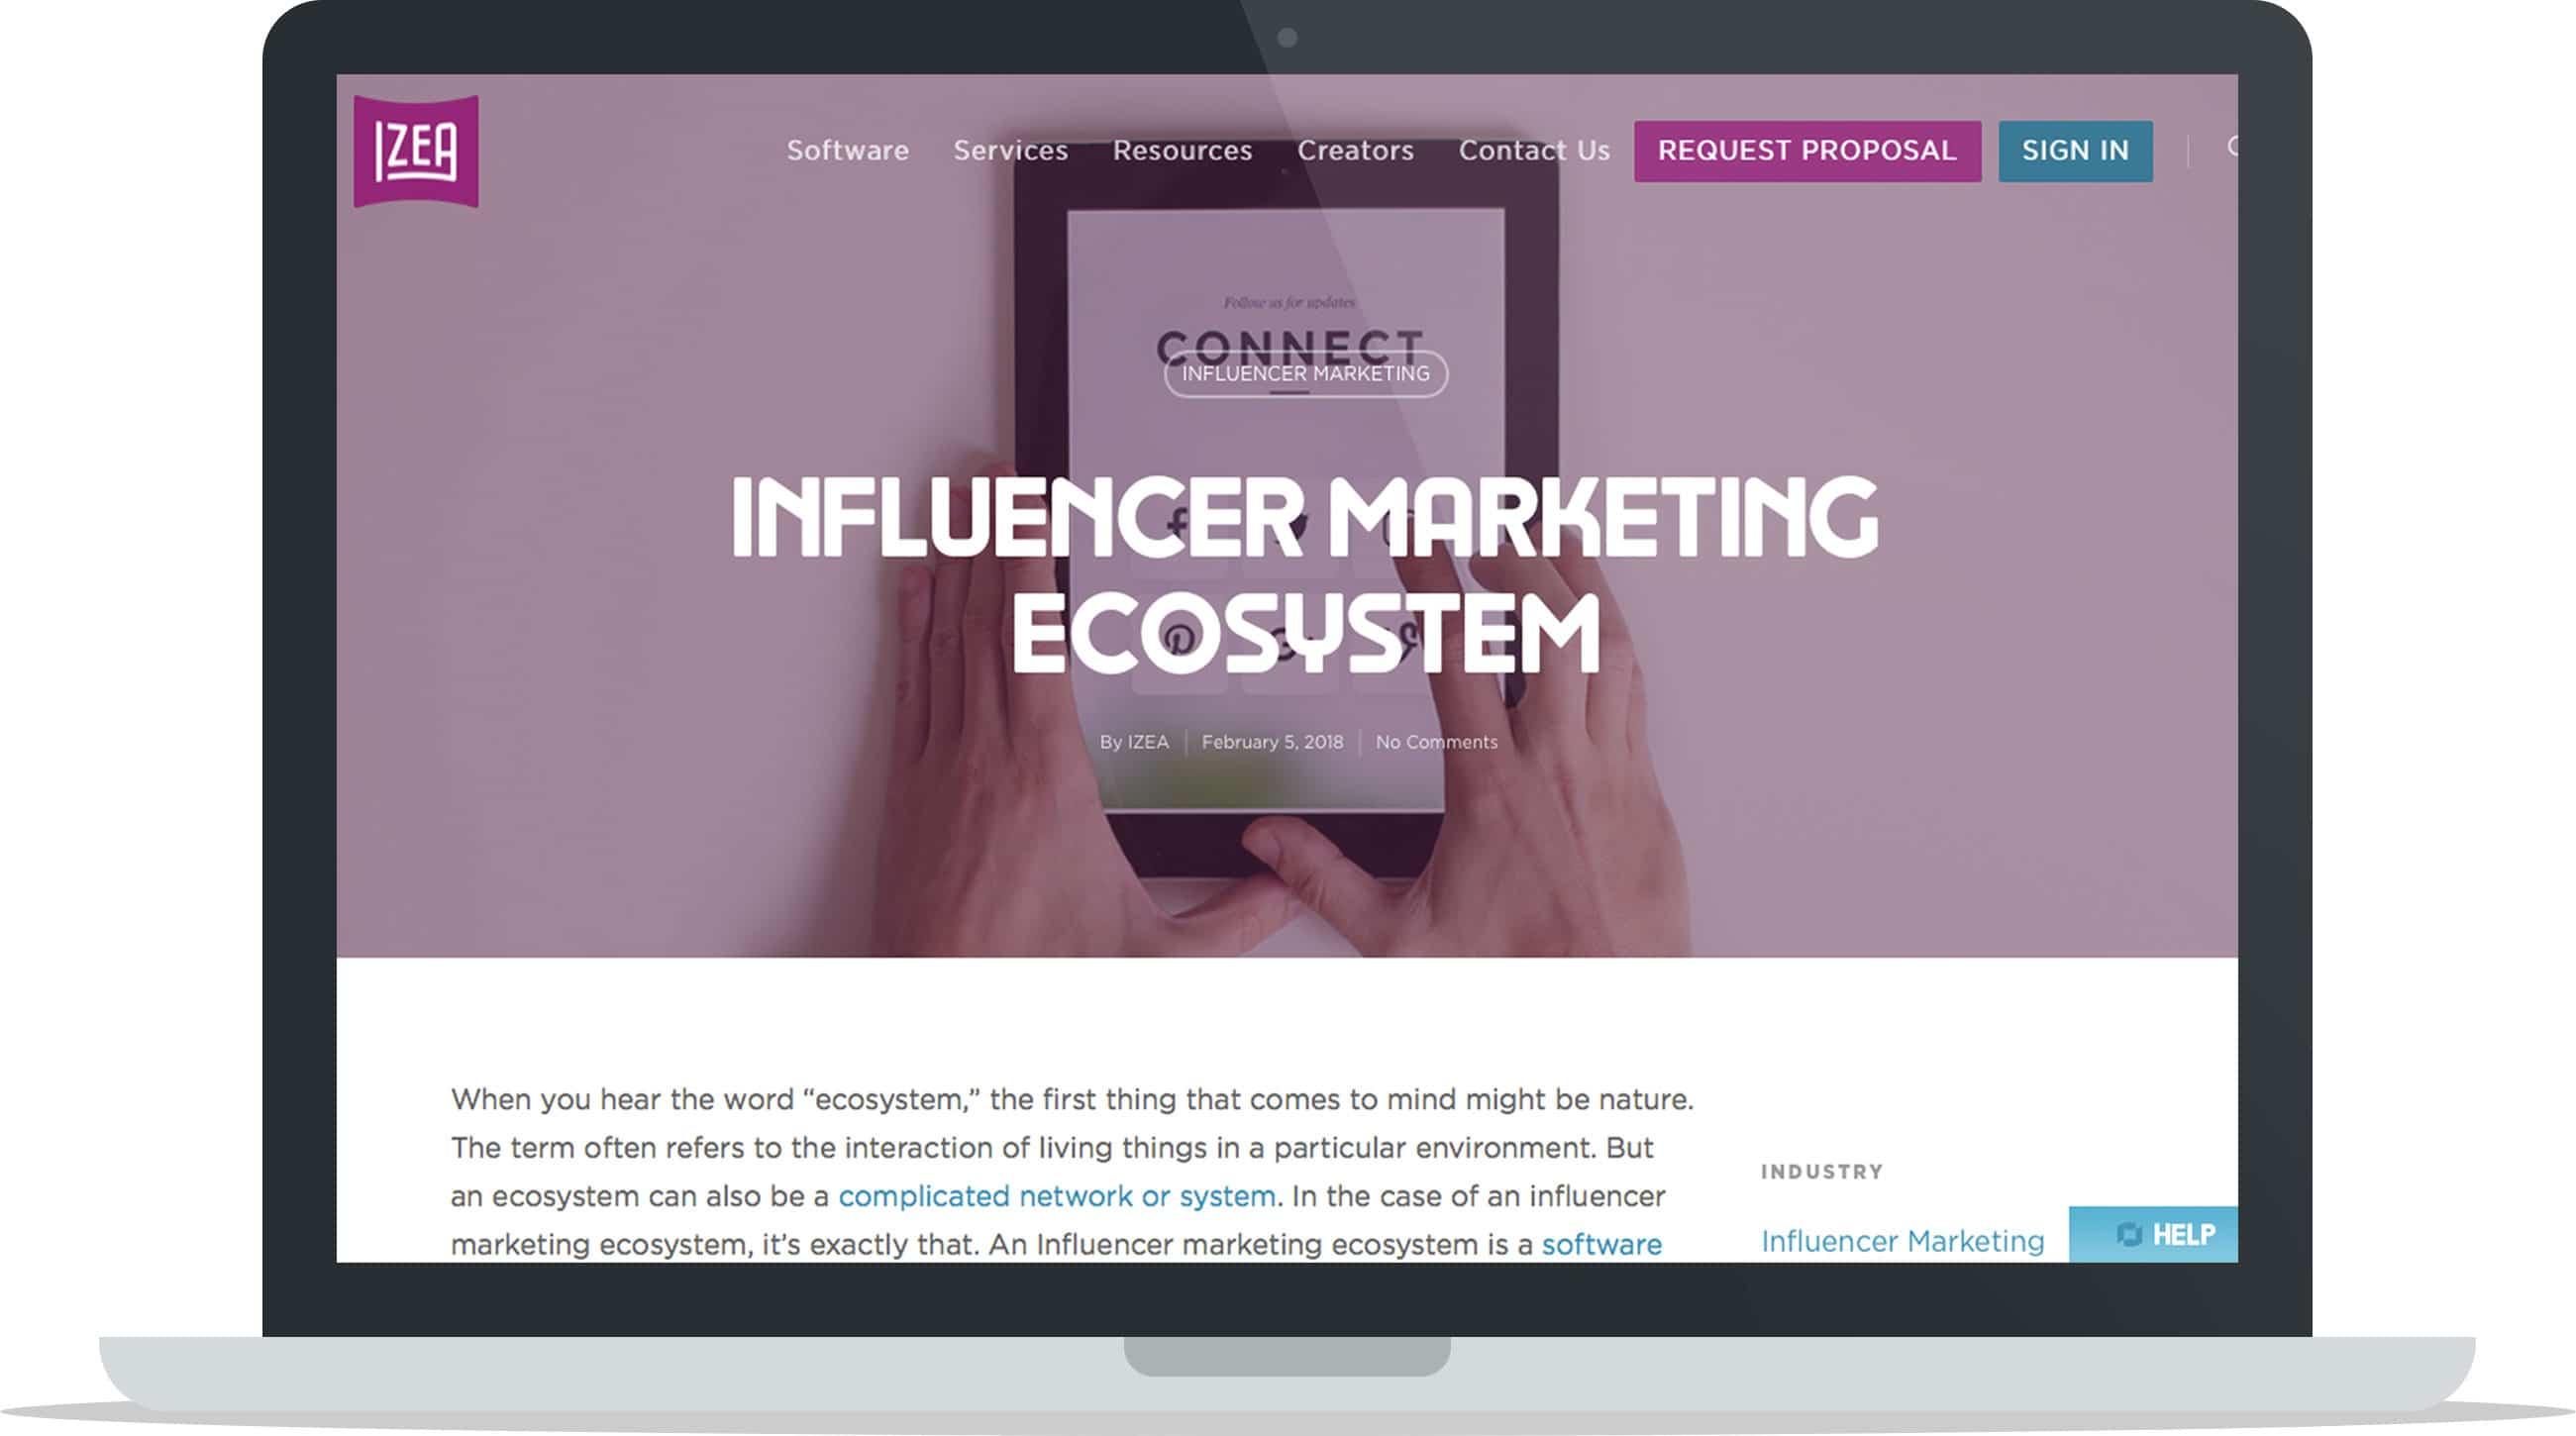 Instagram Influencer Marketing Ecosystem